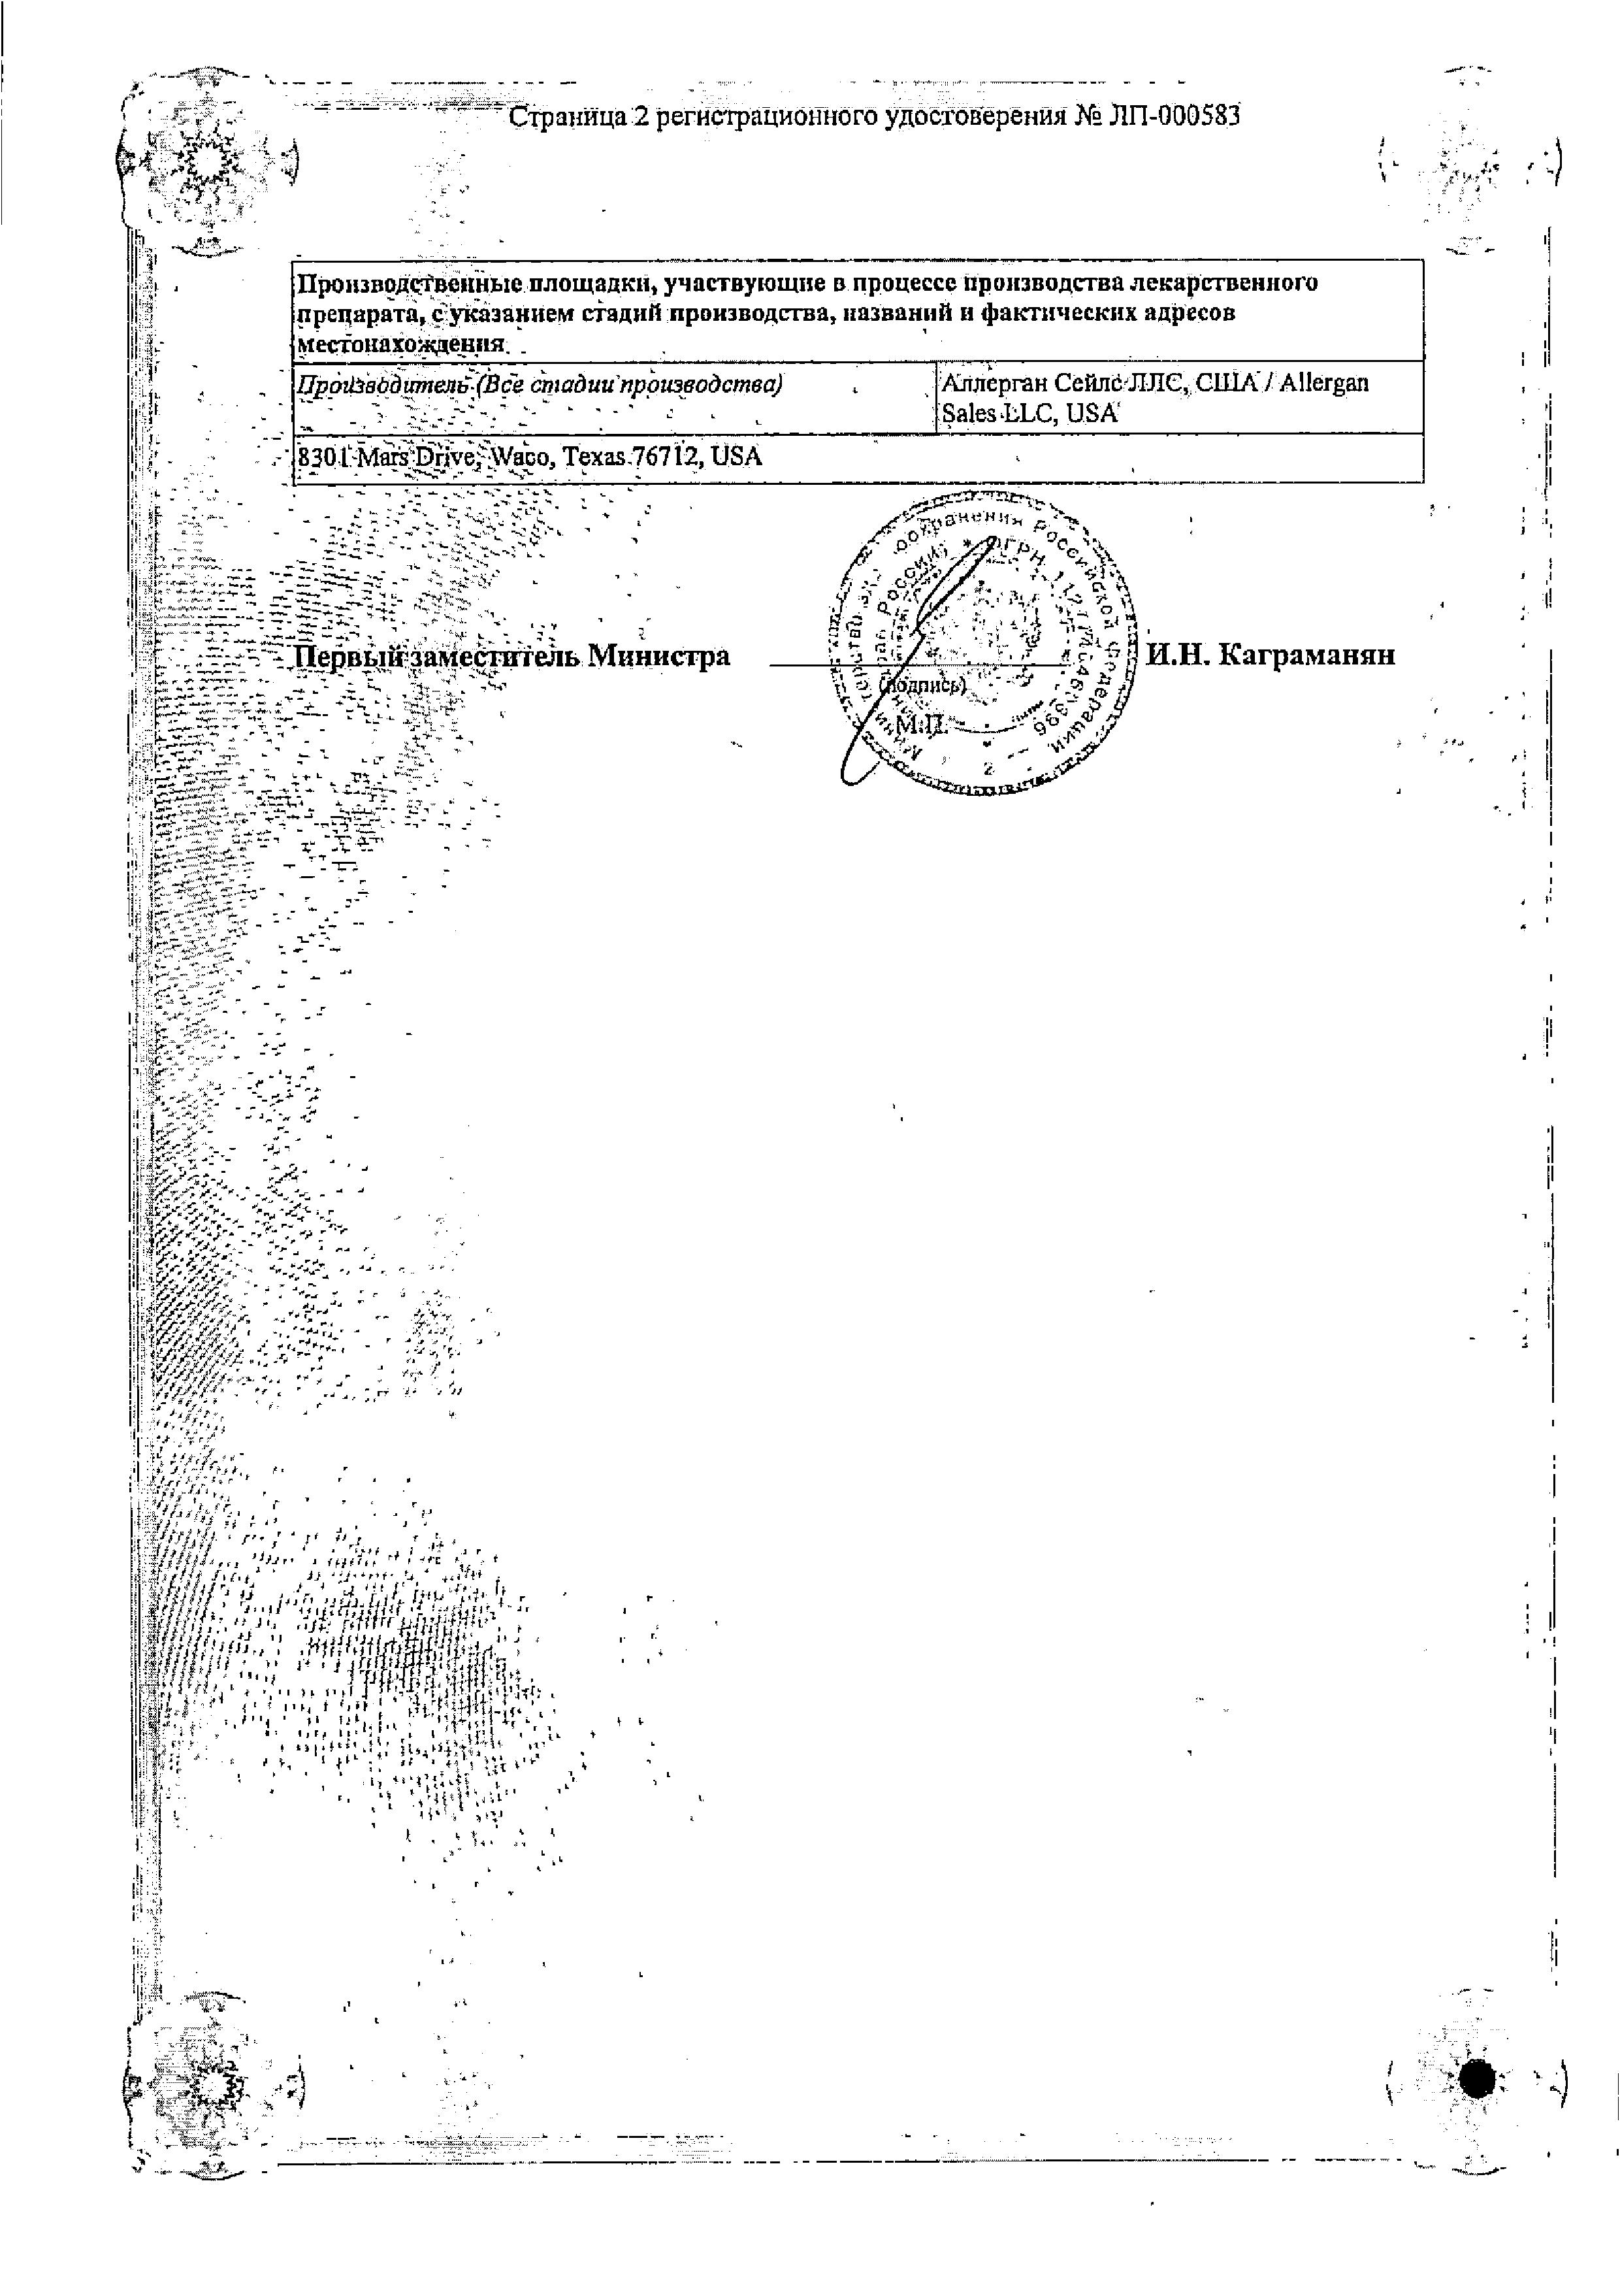 Рестасис сертификат